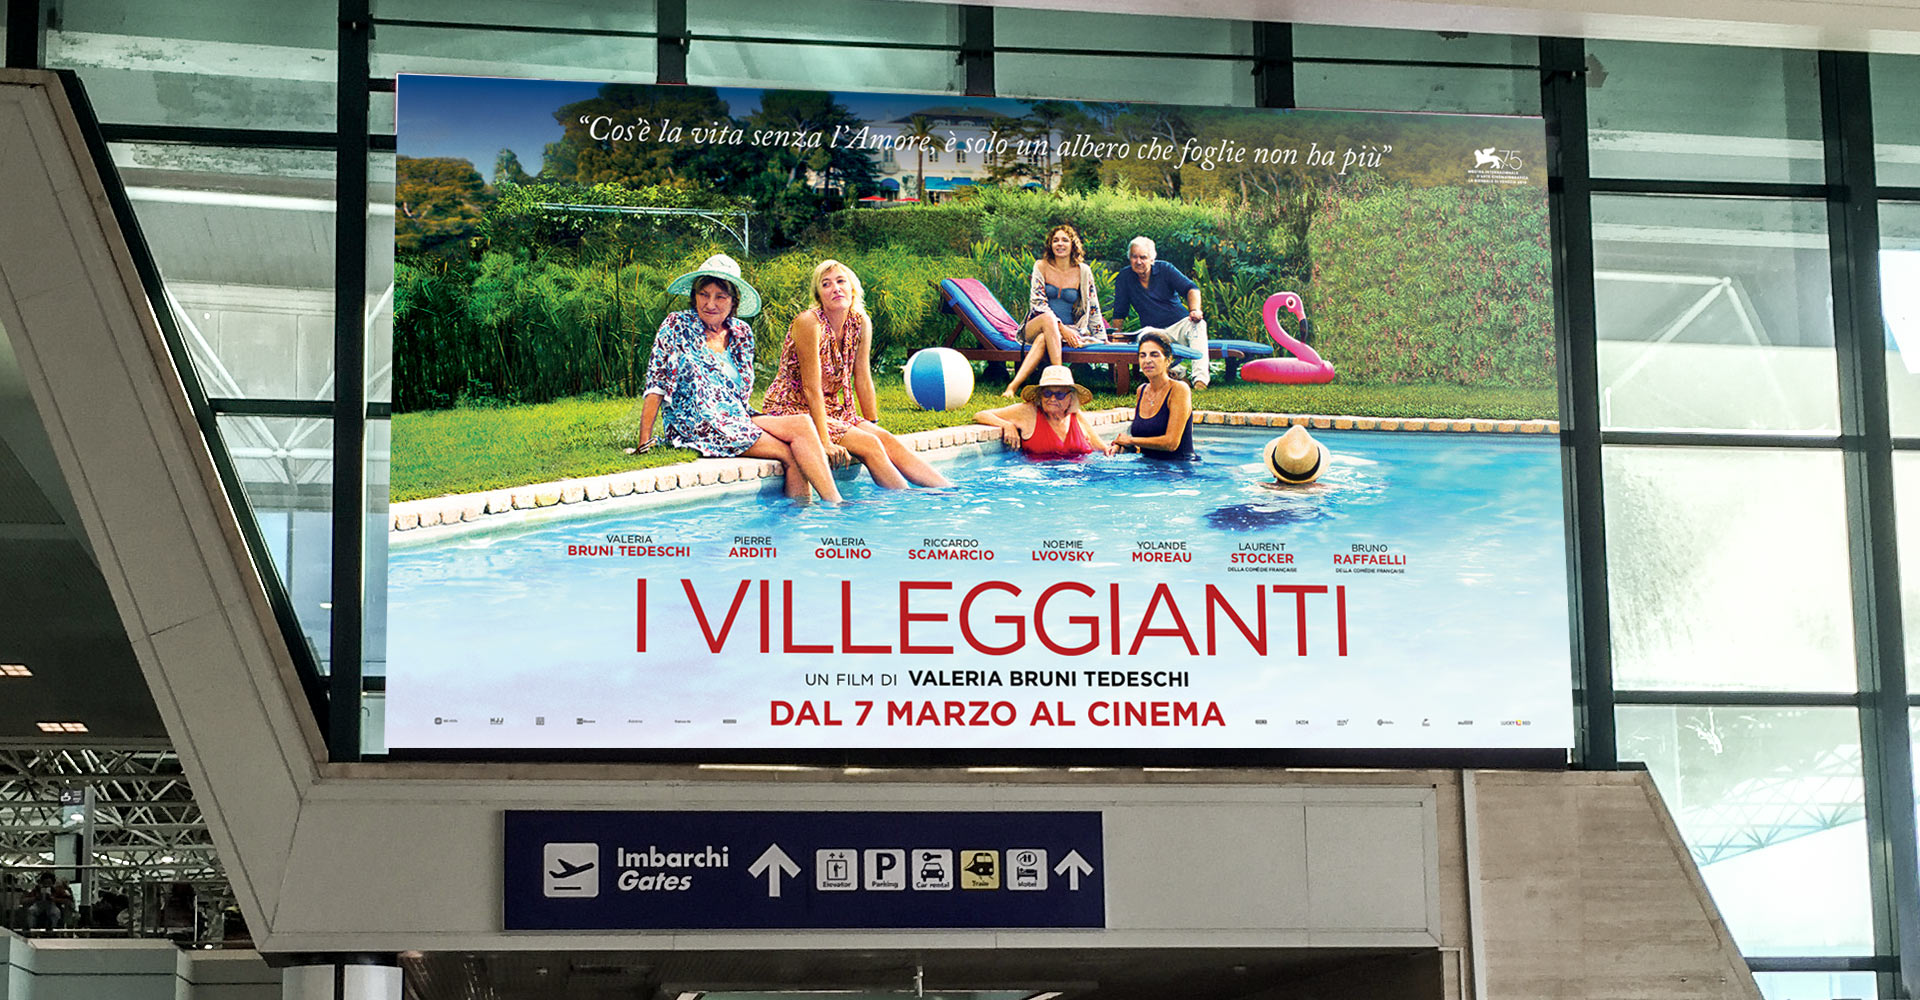 Villeggianti_Behance_02